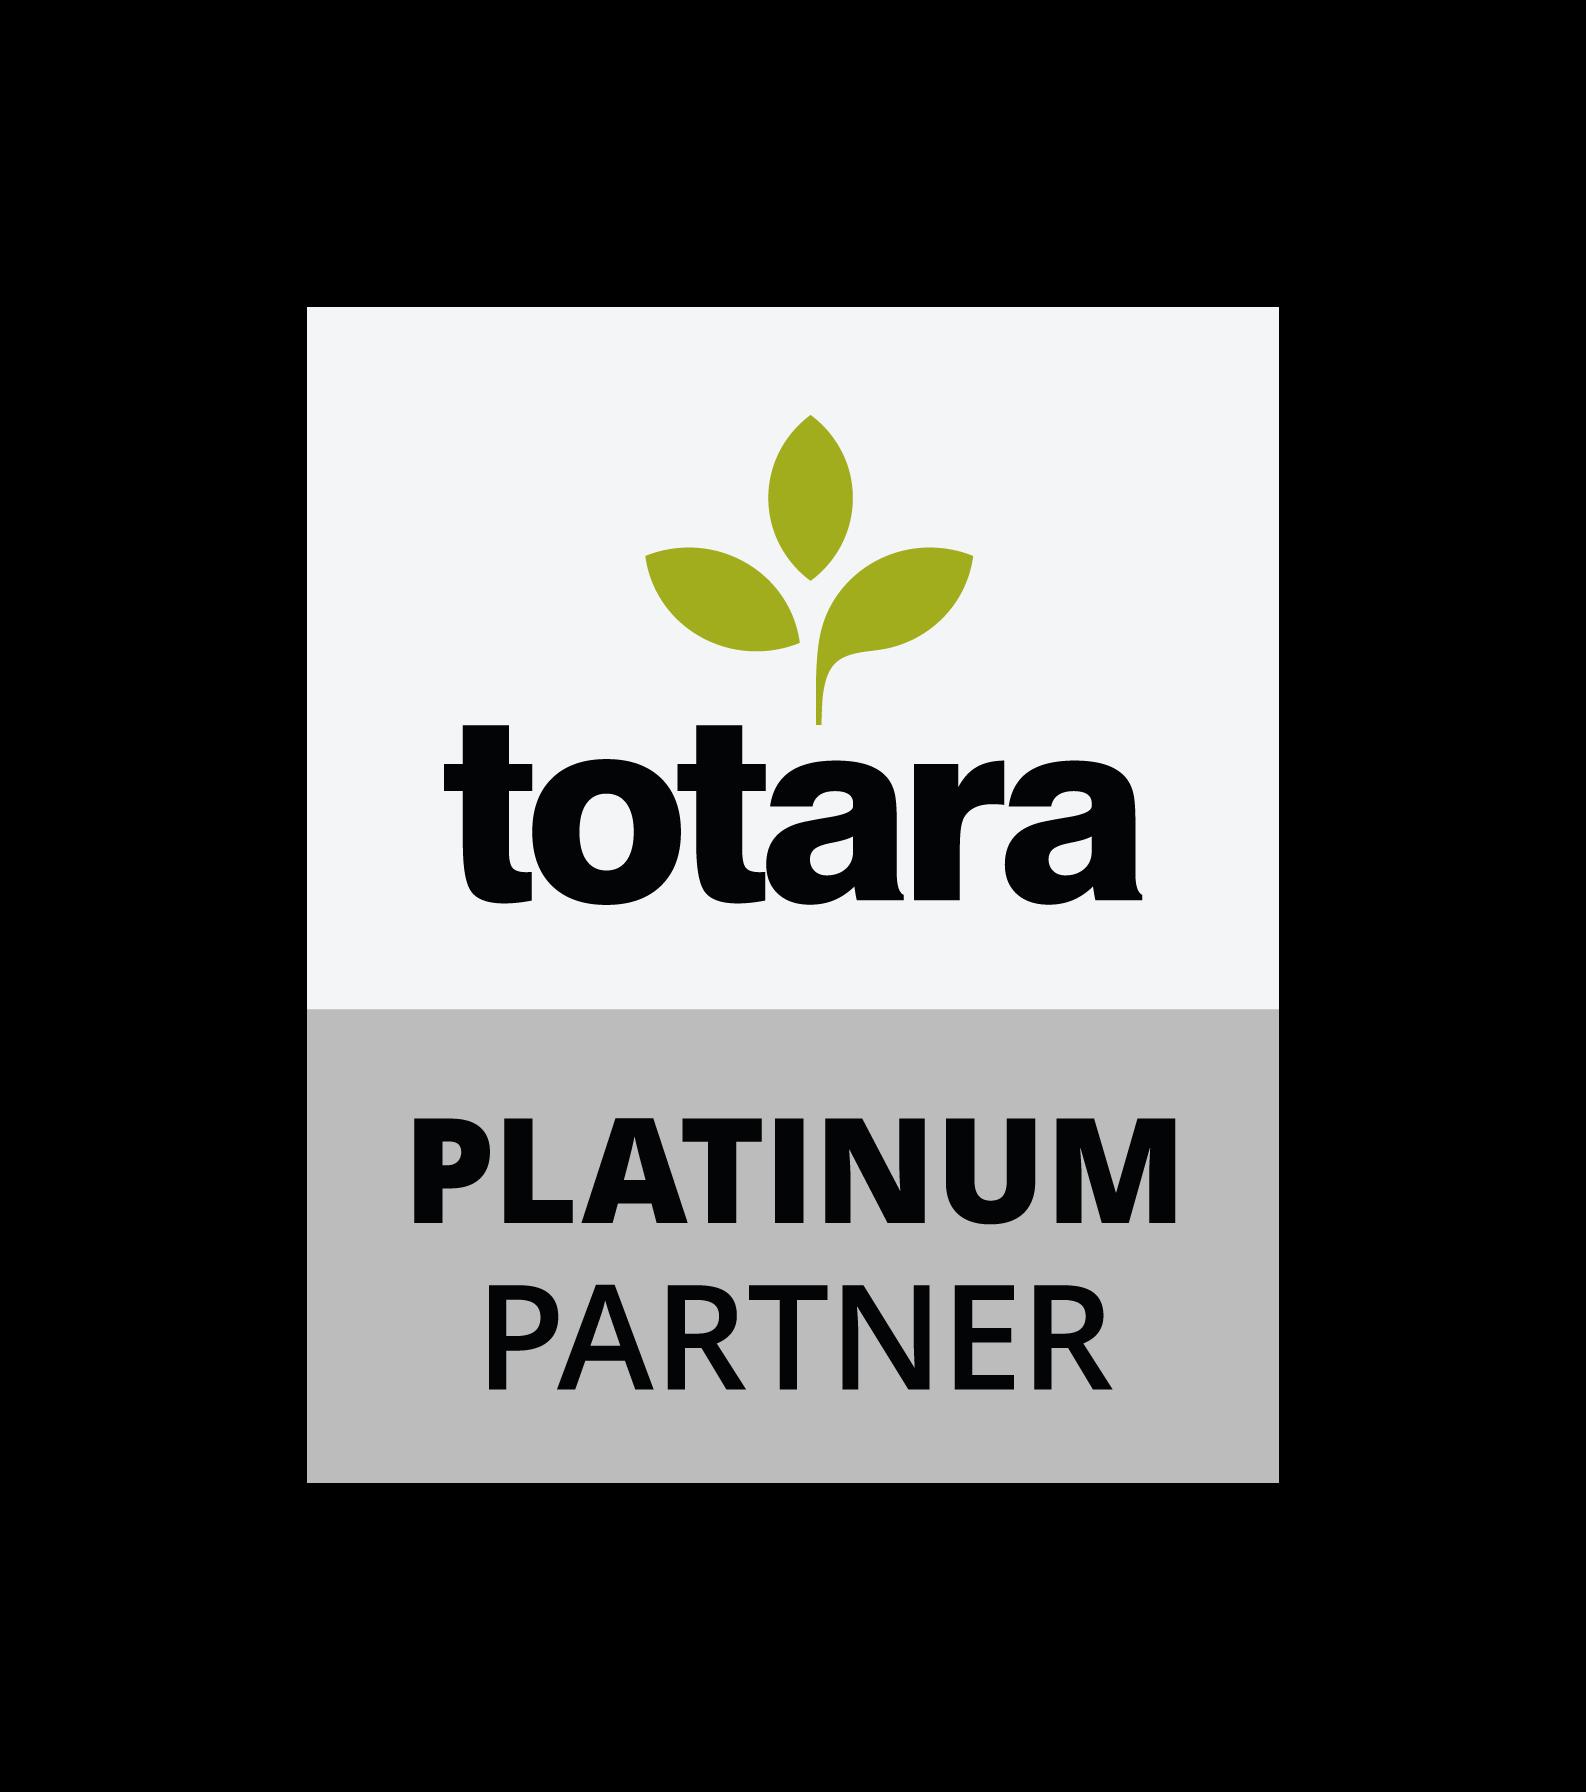 Logo: Totara Platinum Partner